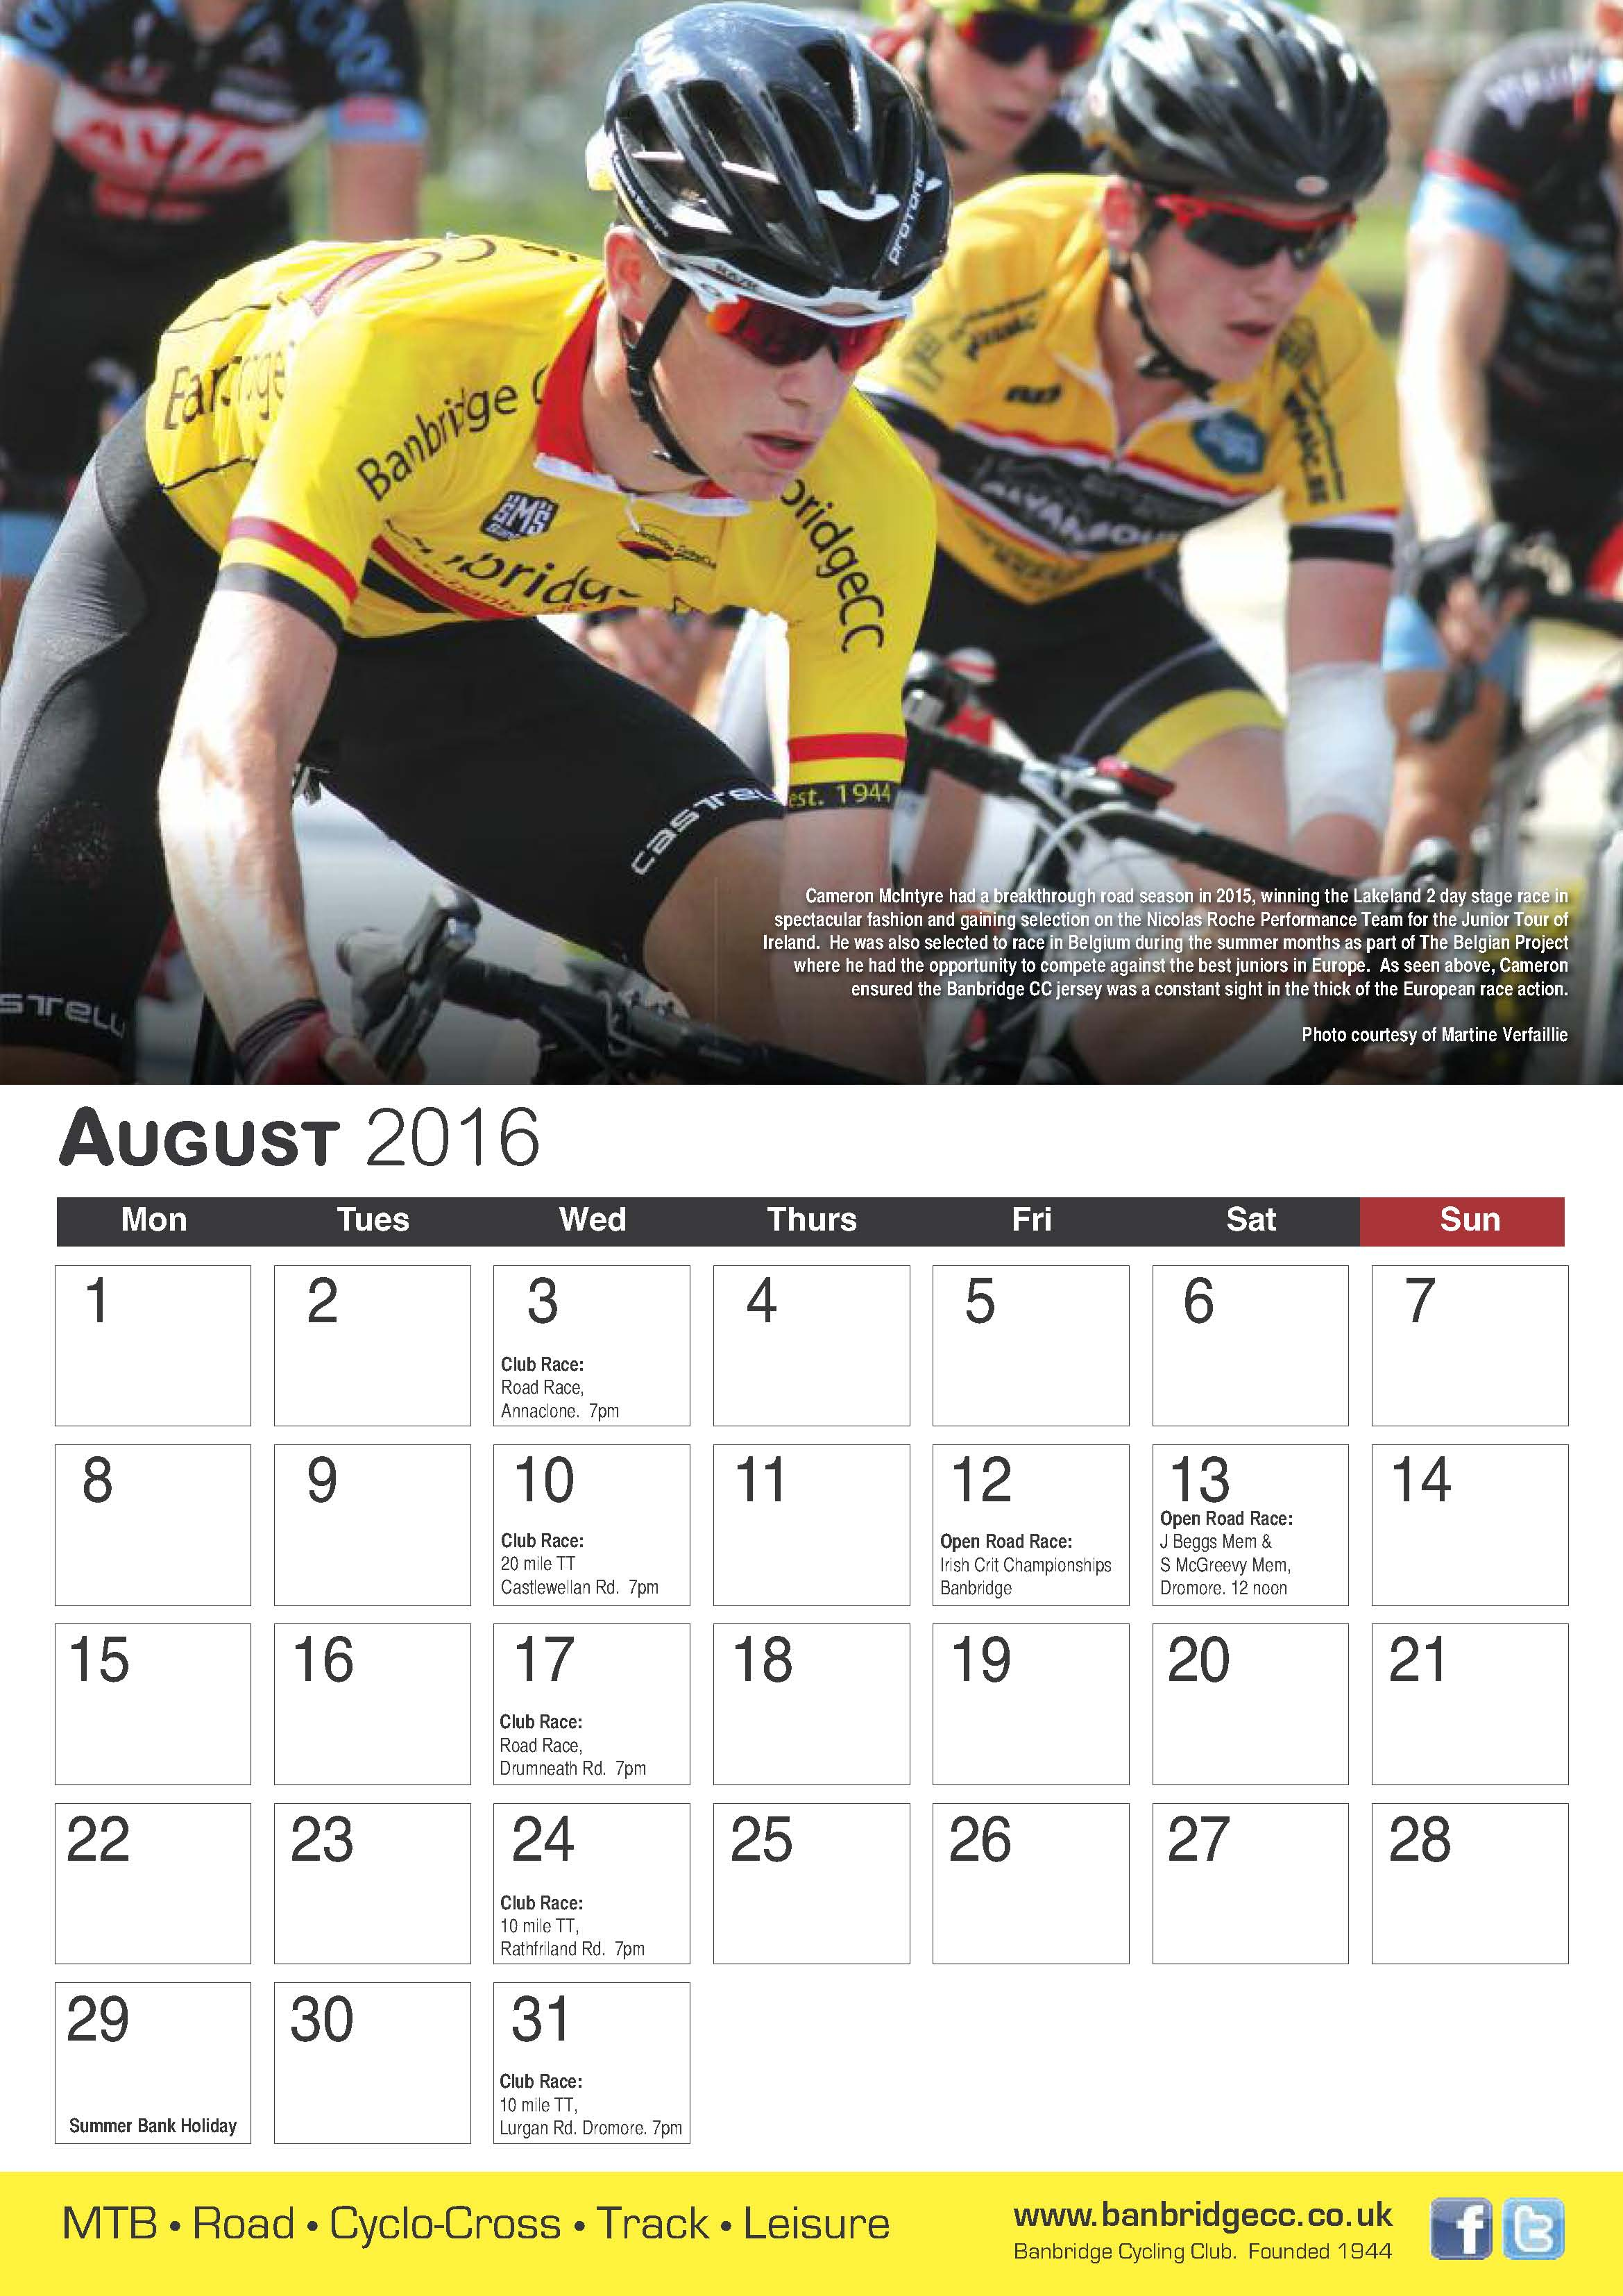 Banbridge CC 2016 Calendar Sample_Page_6.jpg